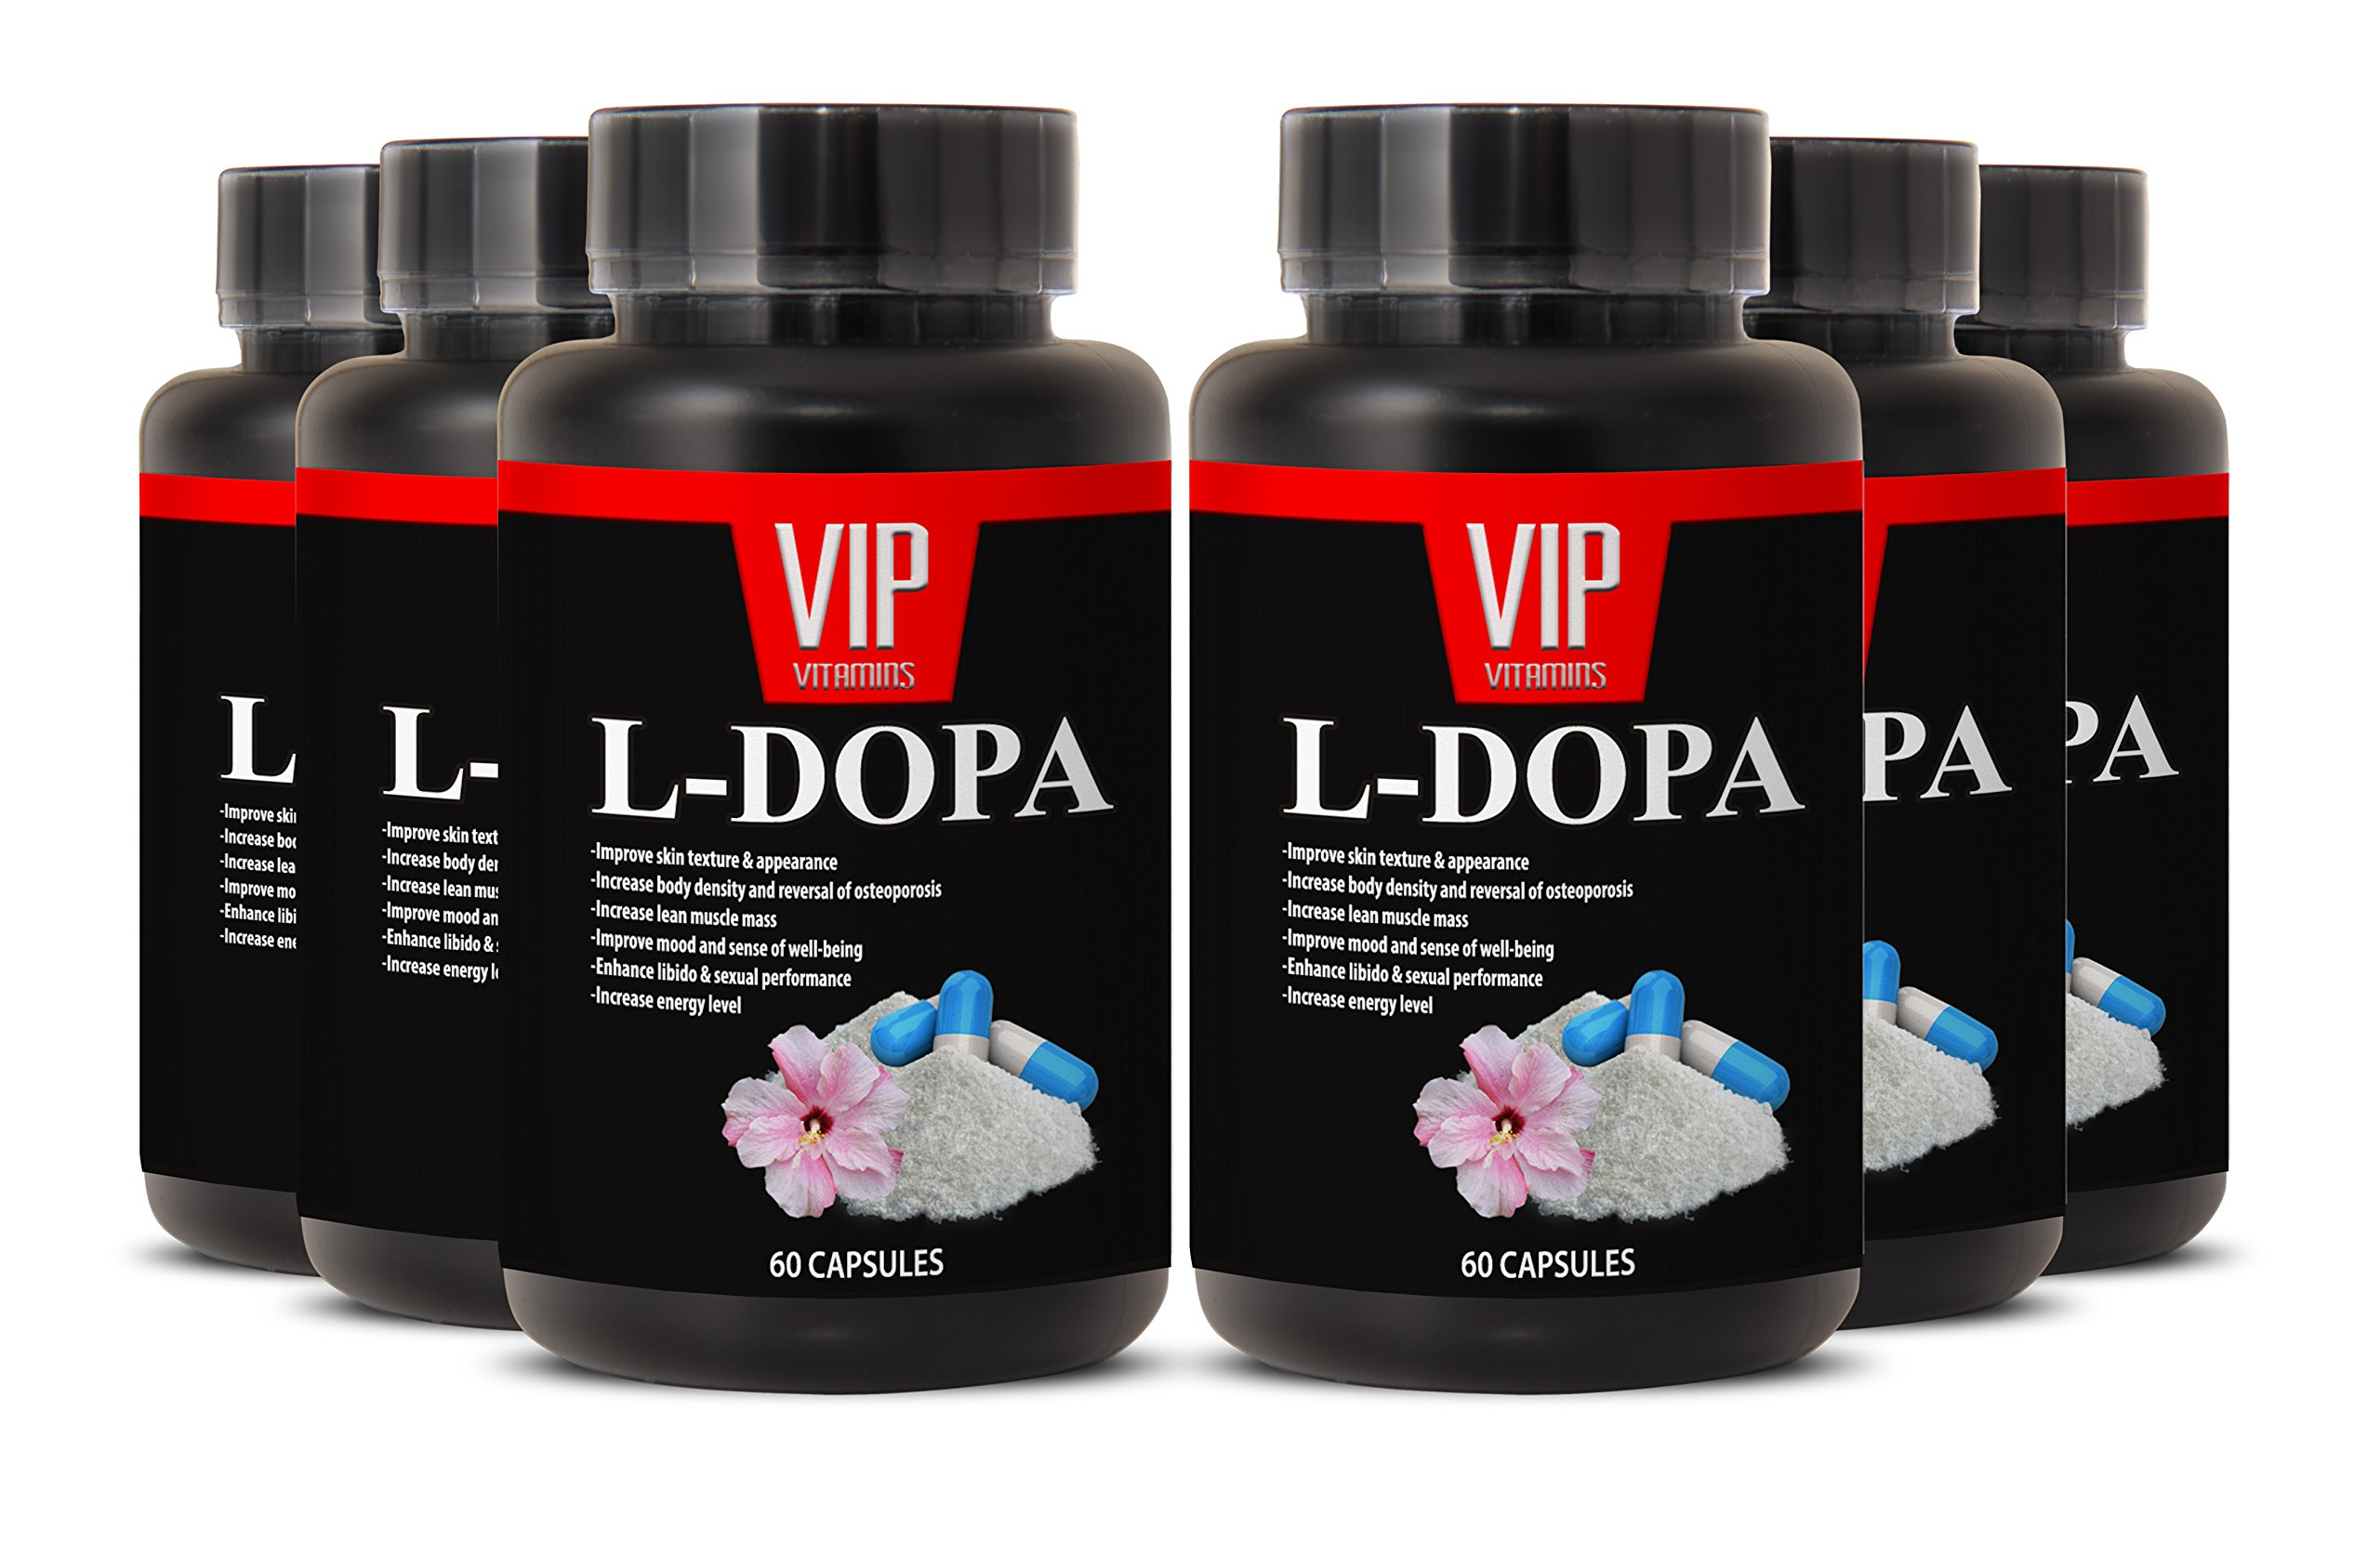 Macuna Pruriens L-Dopa Powder - Mucuna Pruriens Extract (6 bottles 360 capsules) by VIP VITAMINS (Image #1)